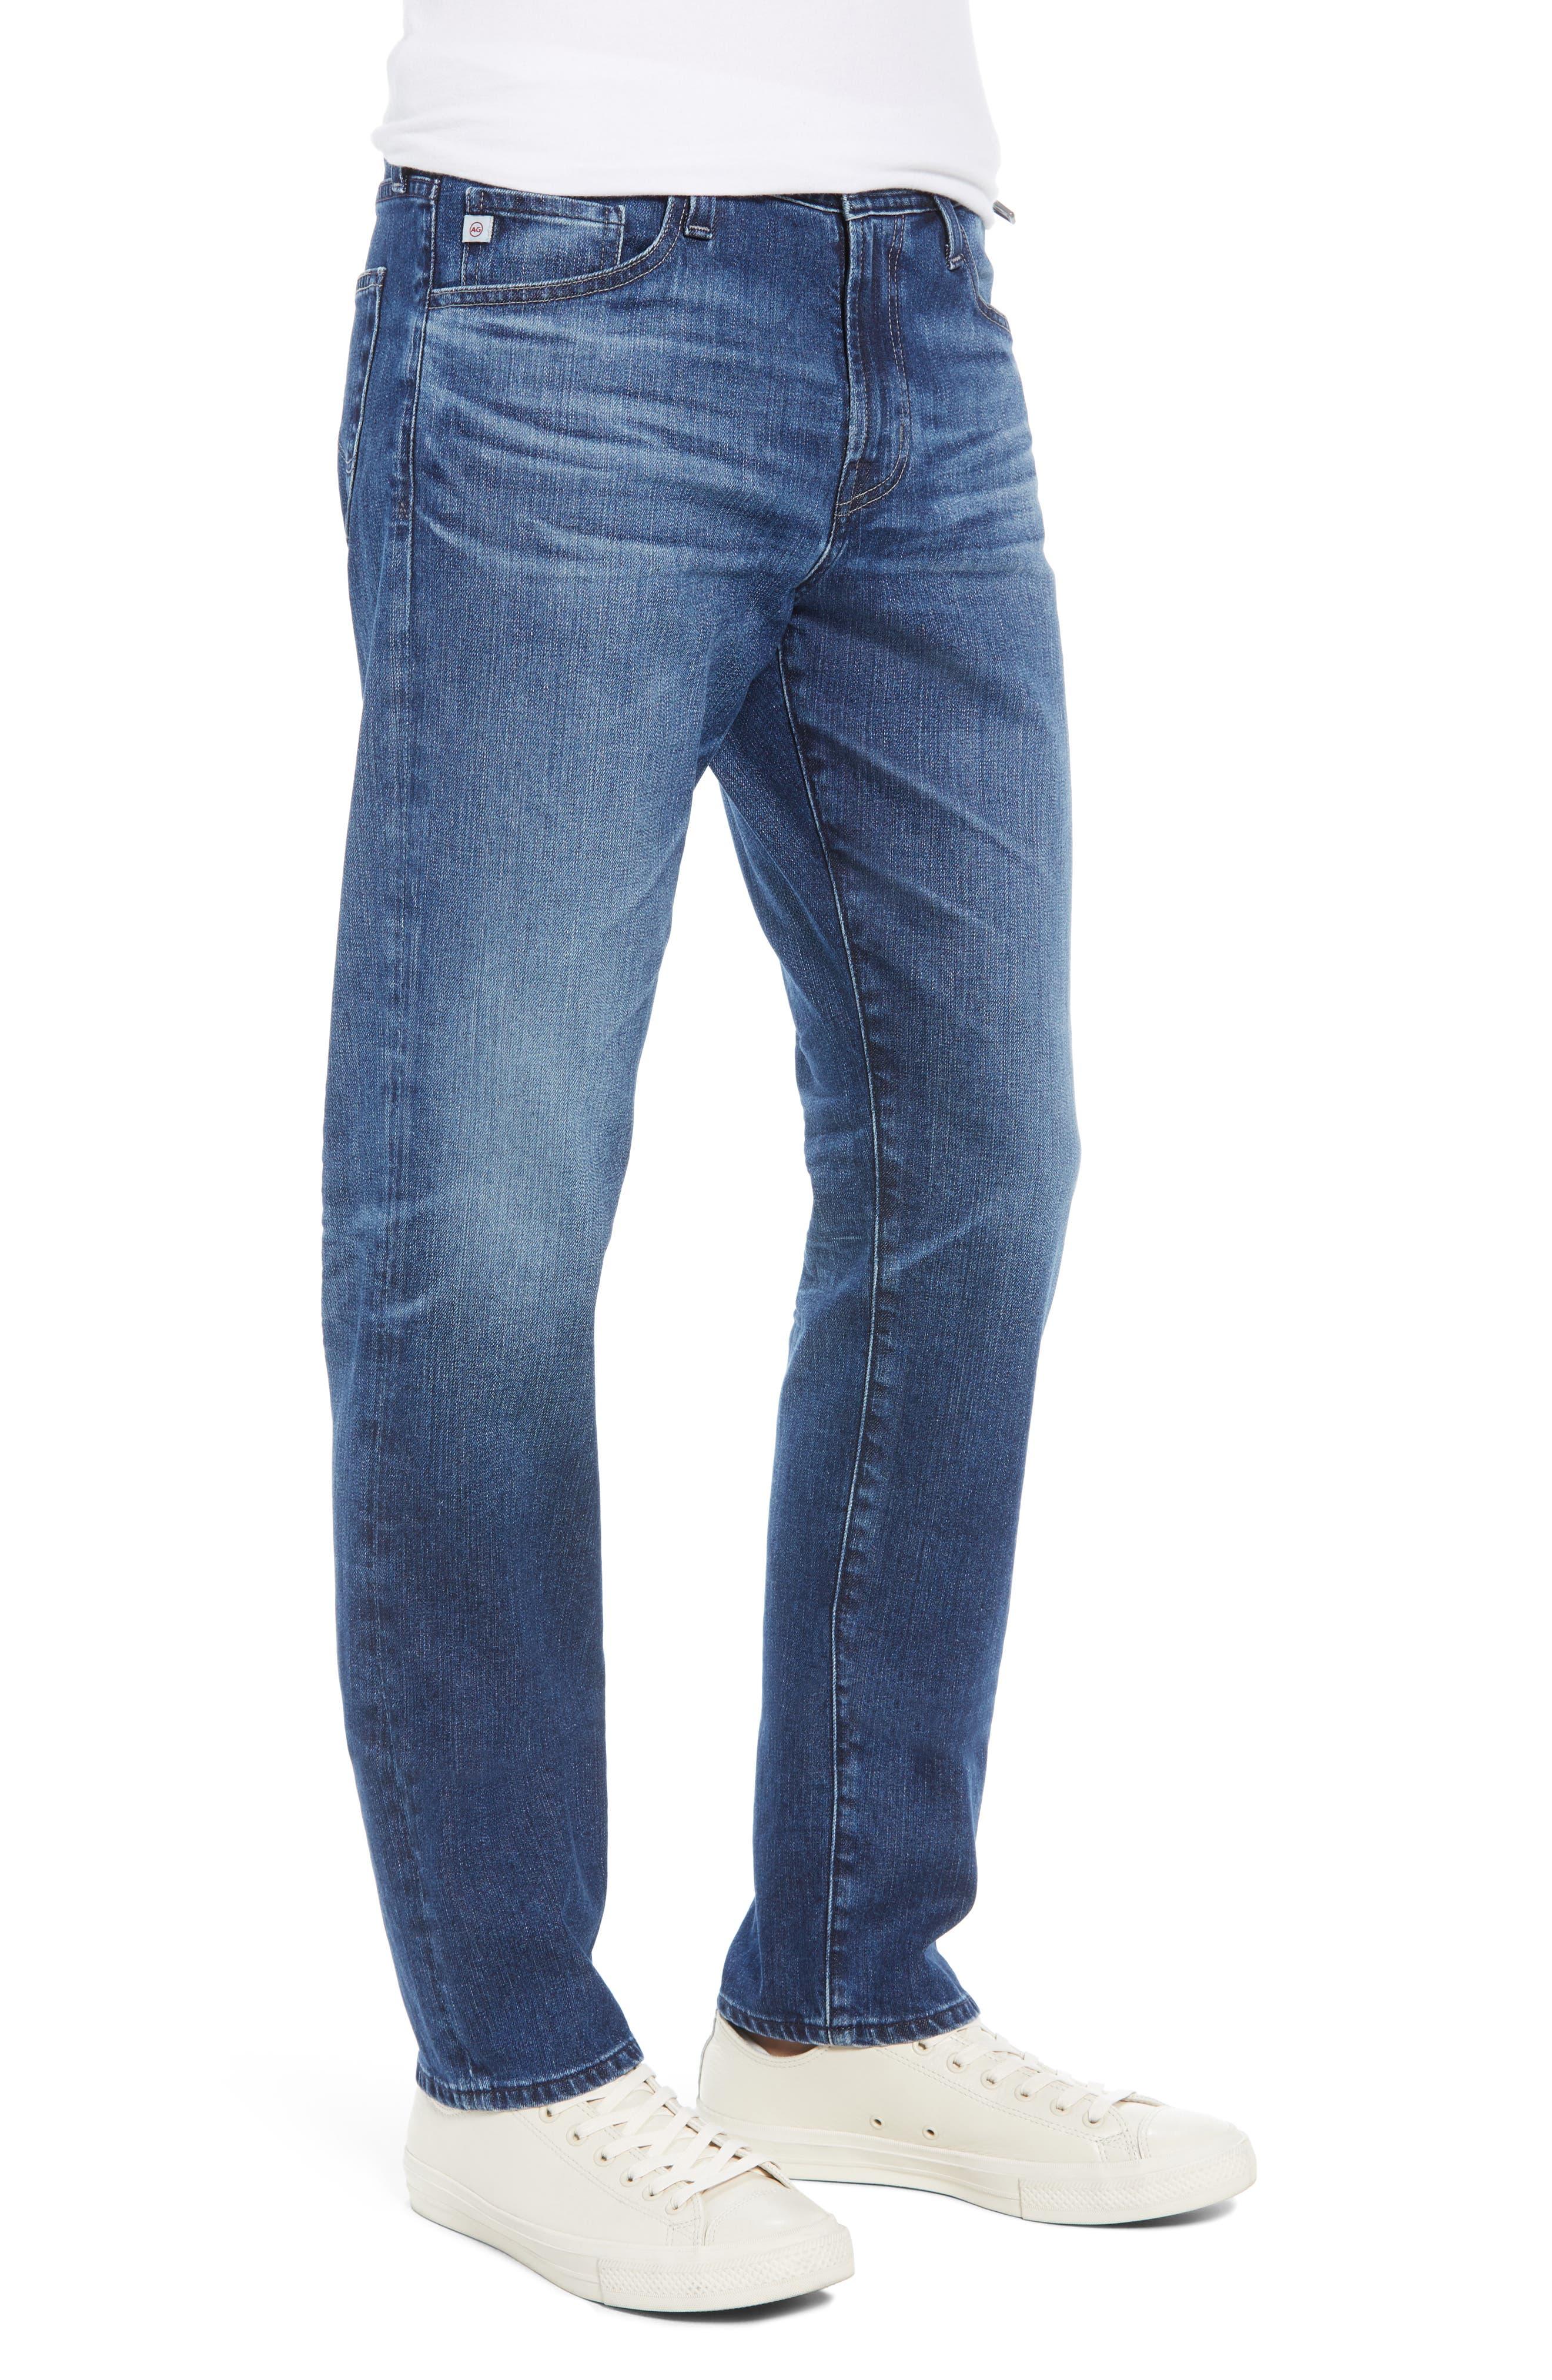 Everett Slim Straight Leg Jeans,                             Alternate thumbnail 3, color,                             9 YEARS SEQUENCE